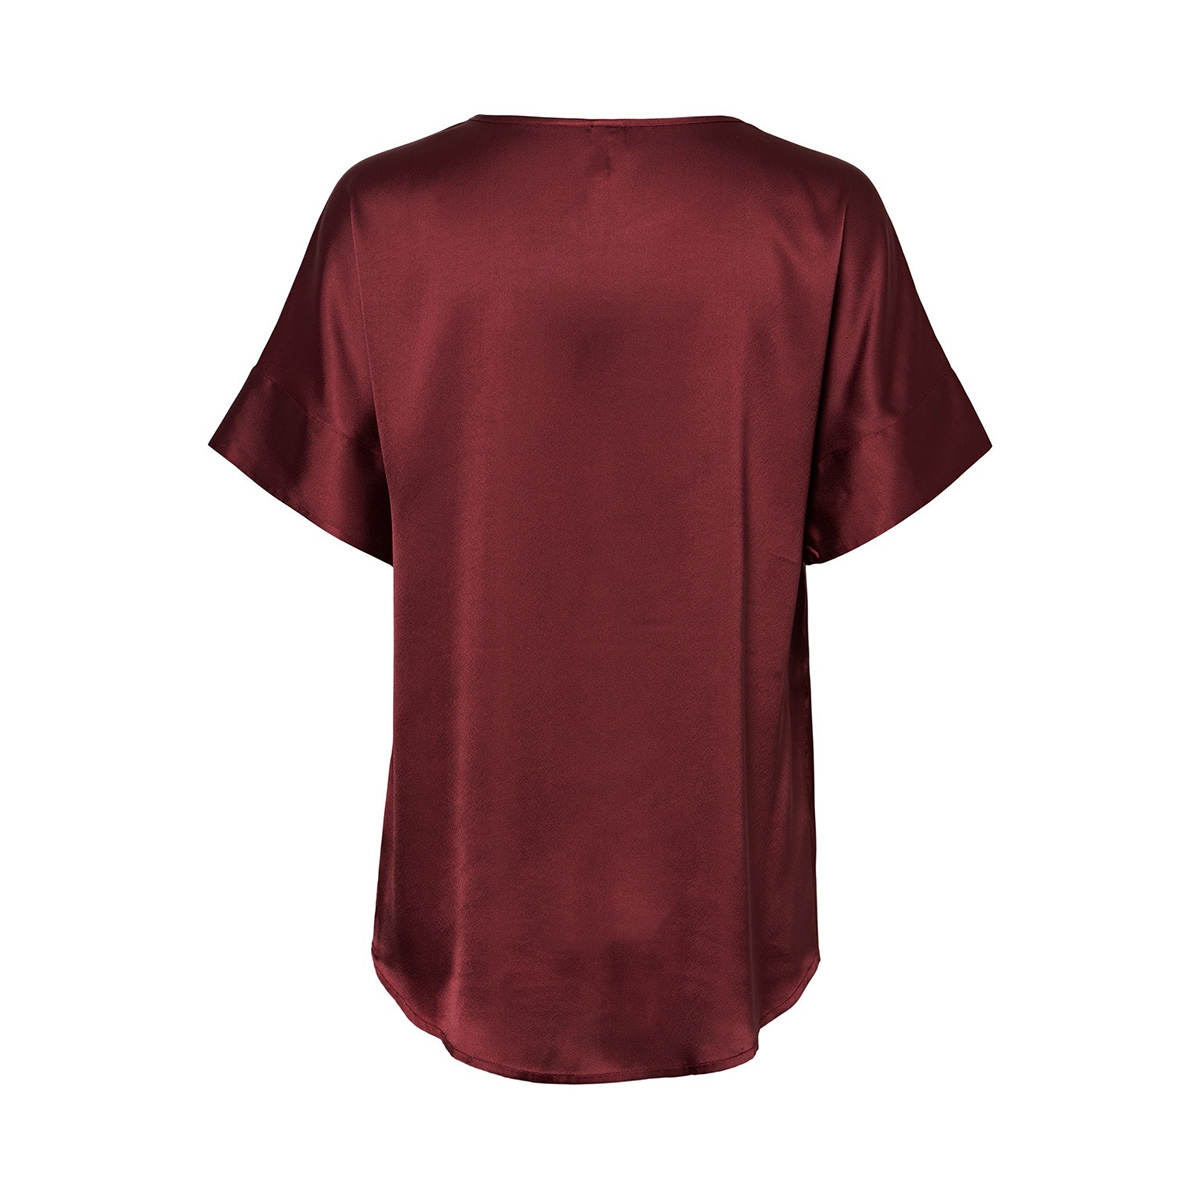 vmjessica 2/4 top sb1 10228384 vero moda t-shirt port royale